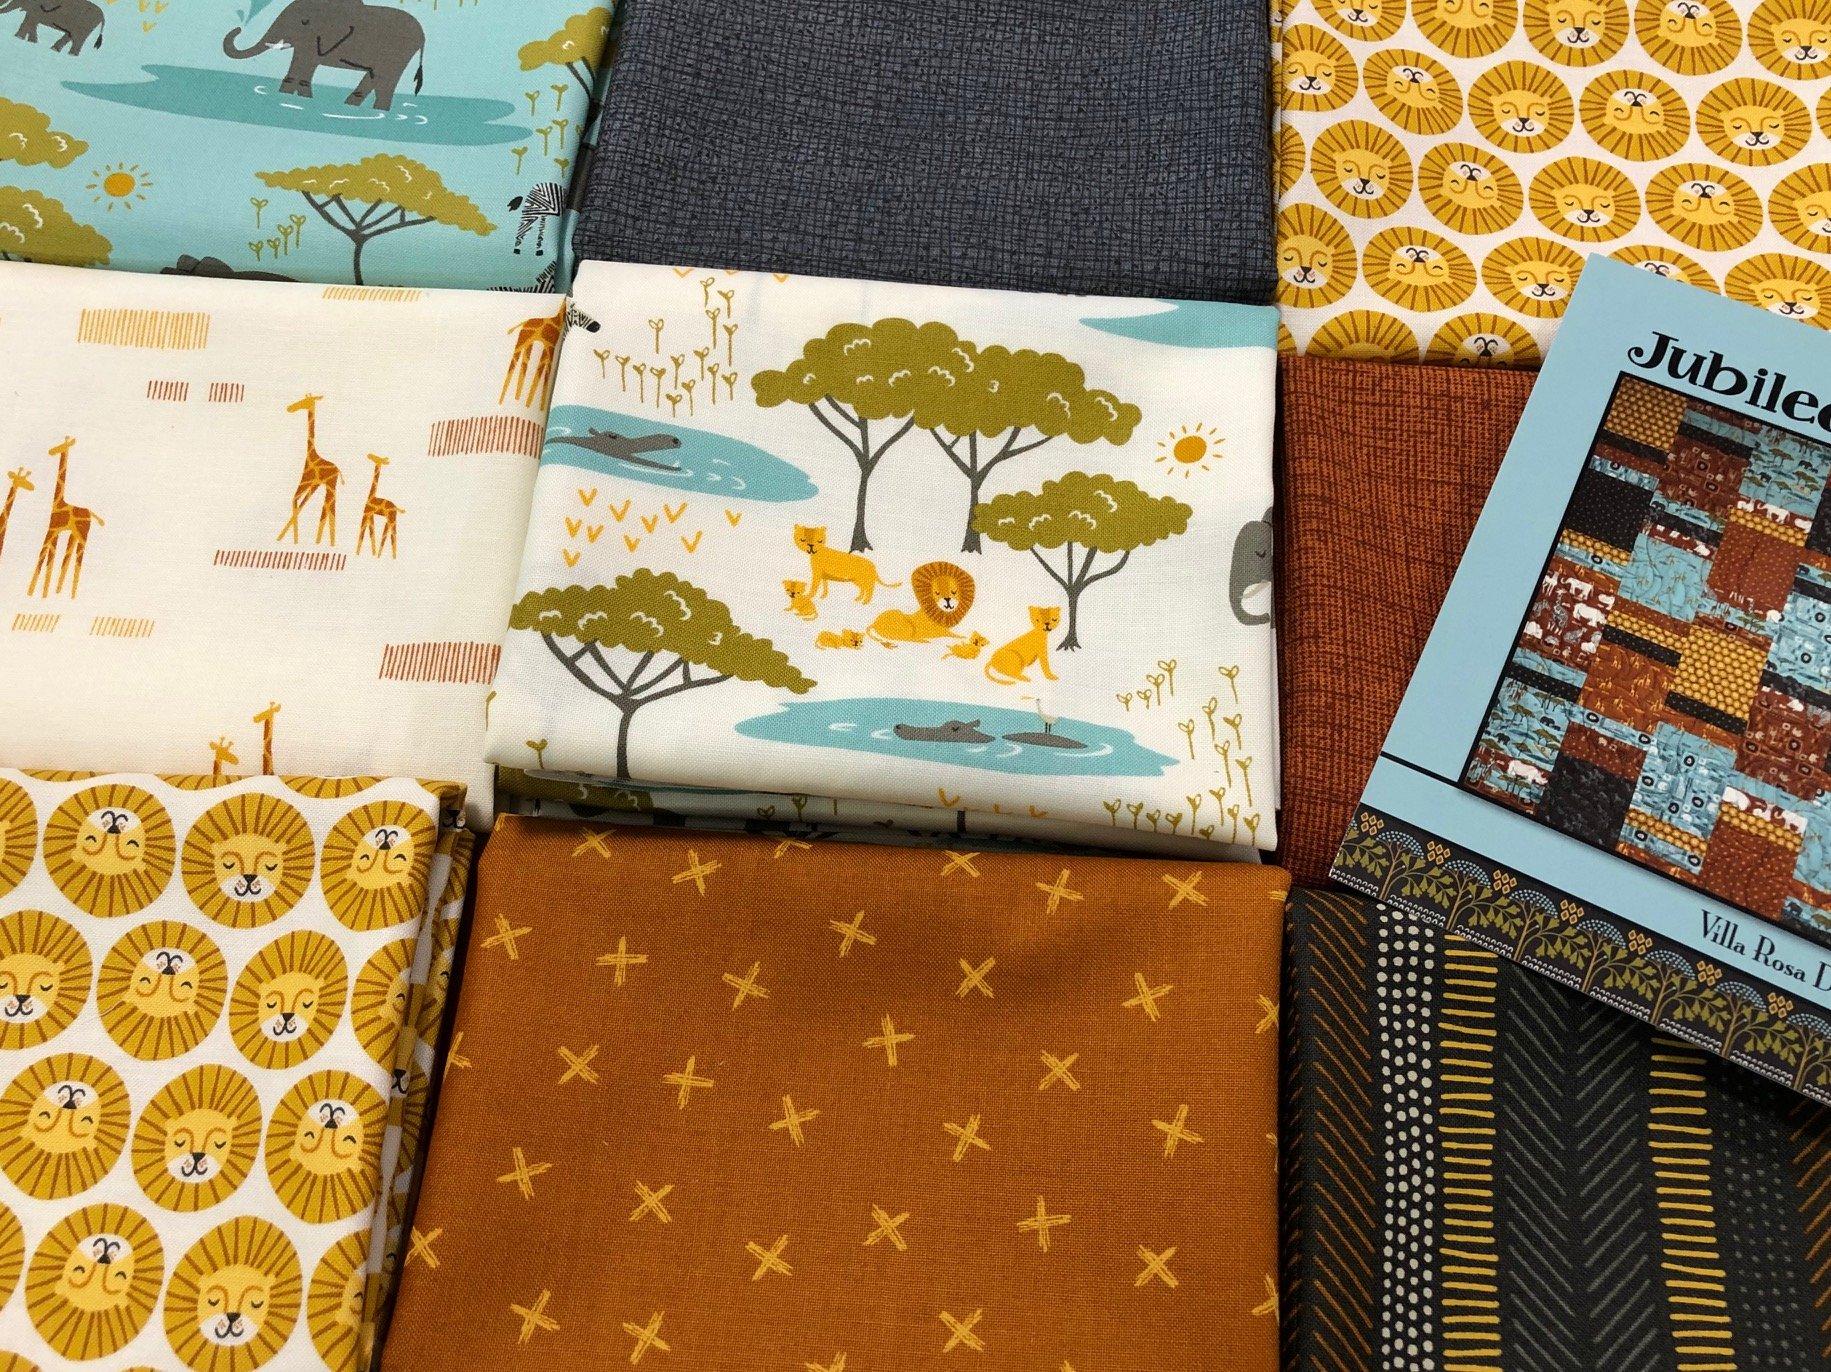 Safari Life Jubilee Quilt Kit 45 x 60